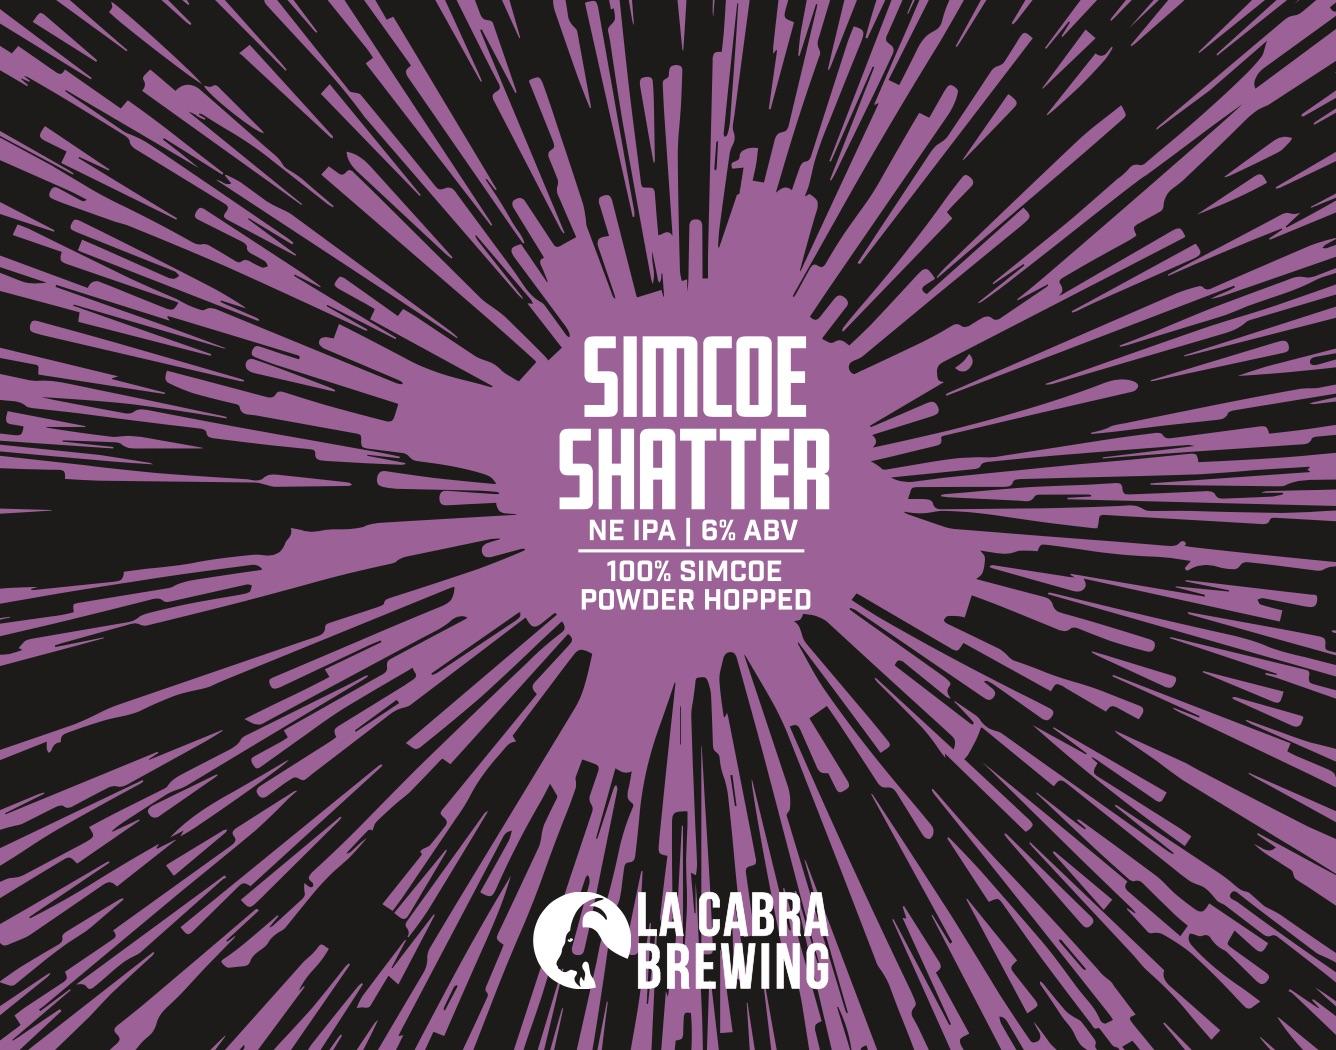 Shat - Simcoe Shatter_2_JPEG.jpg